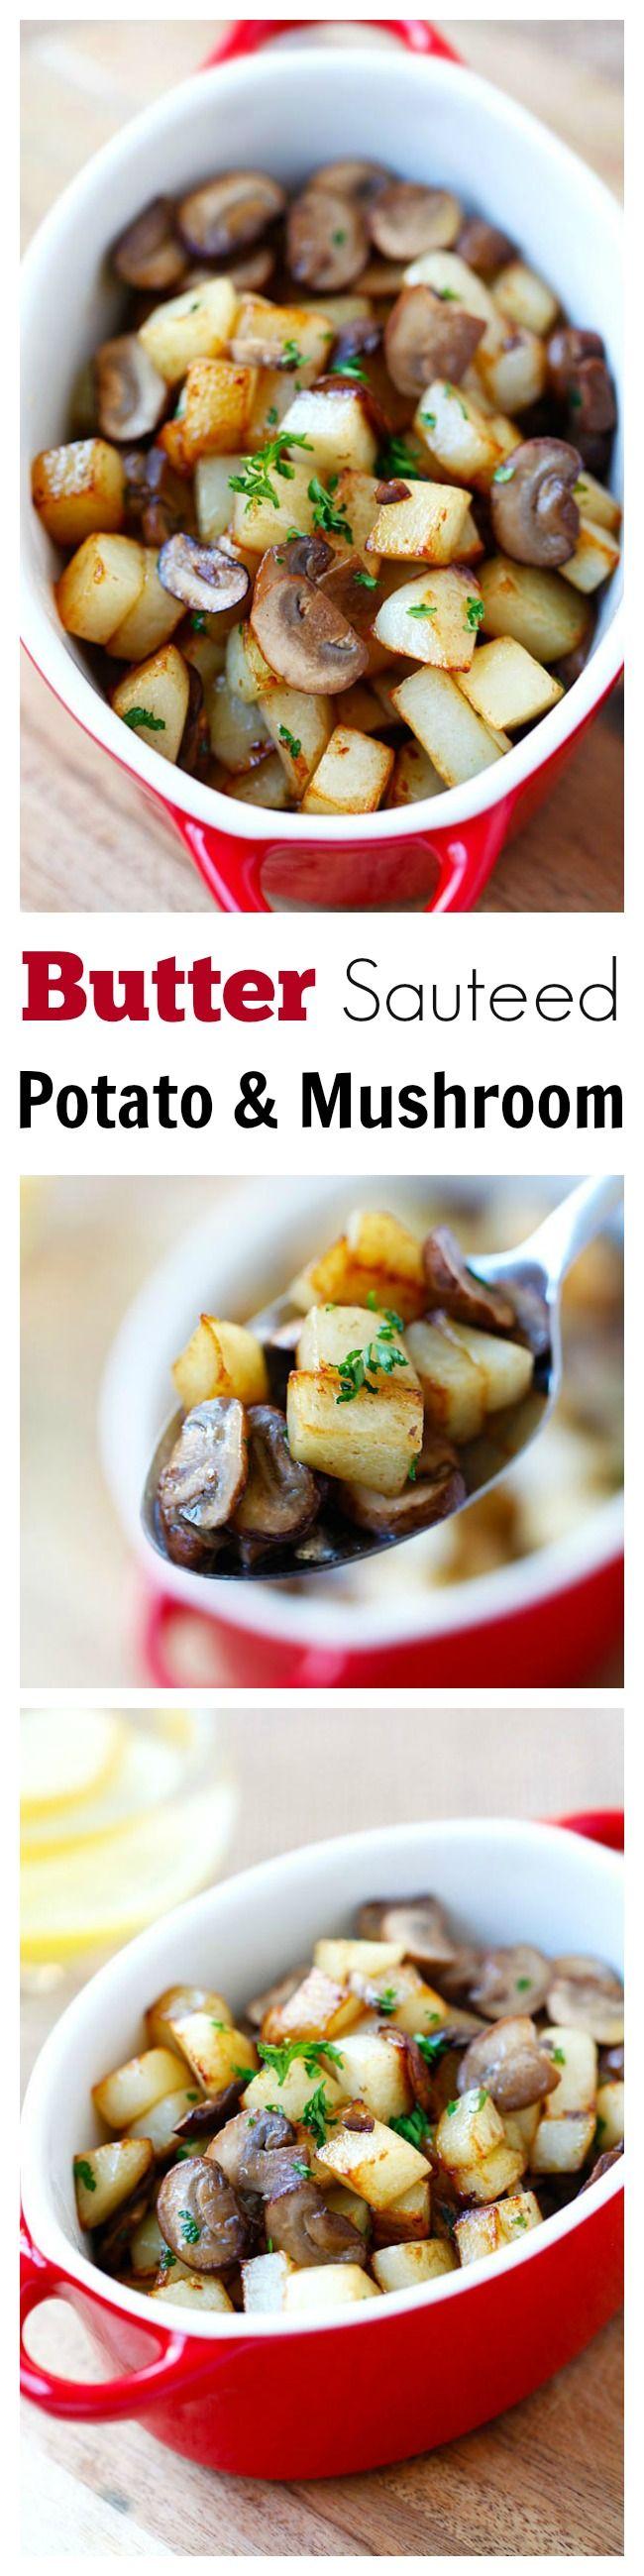 Butter Sauteed Potato and Mushroom – 15-min side dish of potato and mushroom sauteed with butter. Super easy, quick and yummy | rasamalaysia.com